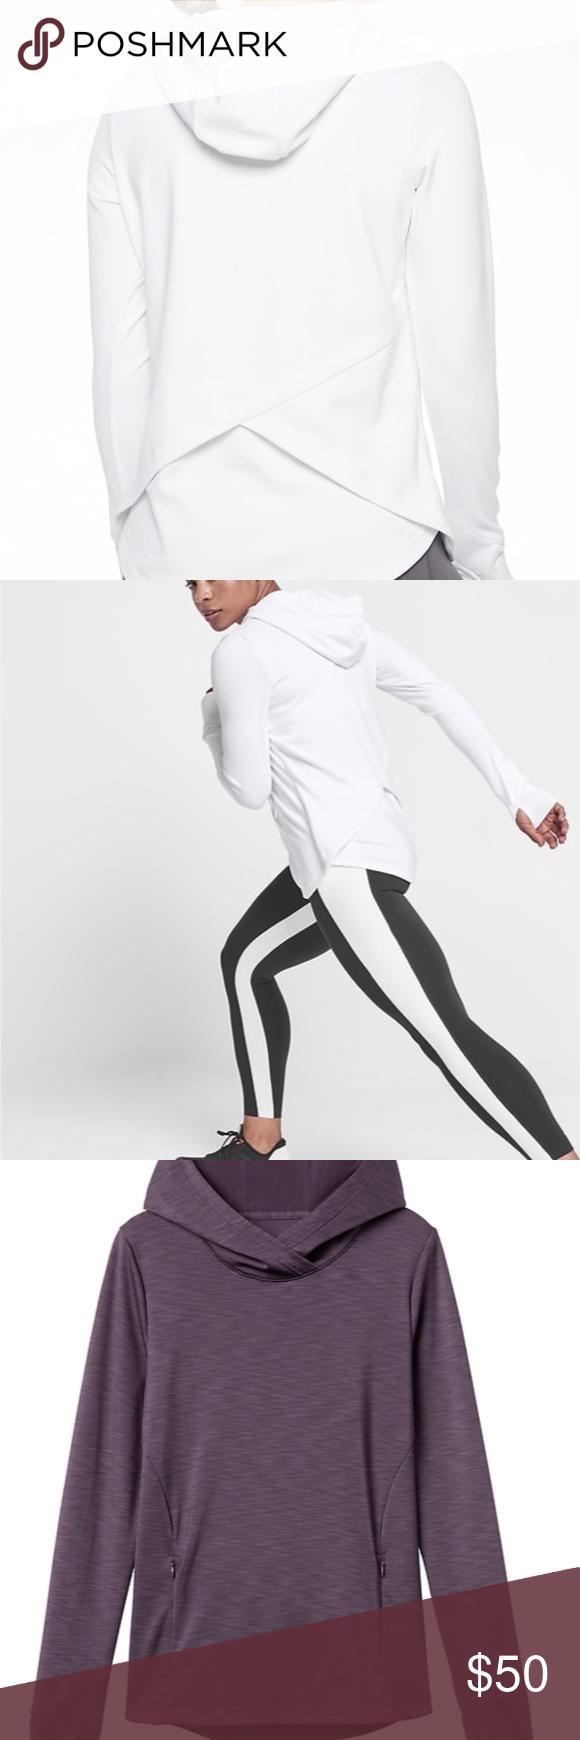 Athleta Bootcamp Hoodie Sweatshirt Medium White Athleta Bootcamp Hoodie Sweatshirt Medium M White Workout Top White Workout Top Sweatshirts Hoodie Sweatshirts [ 1740 x 580 Pixel ]